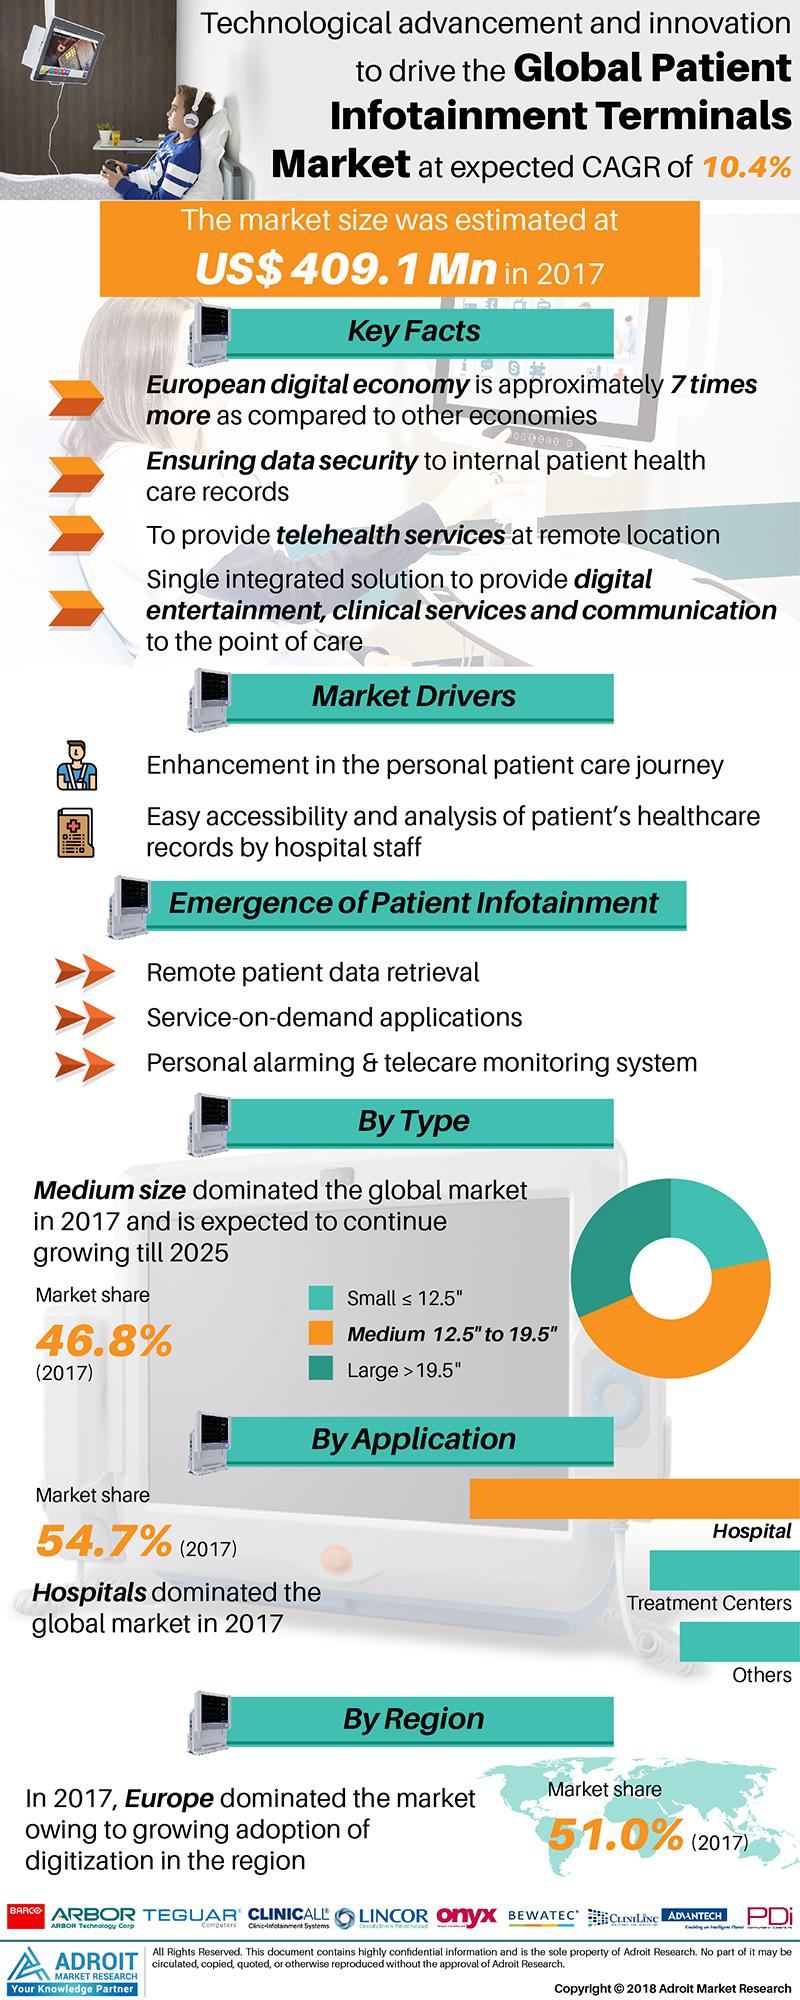 Patient Infotainment Terminals Market 2019-2025: Technology Trends, Regional Demand & Market Size Estimation, Consumption,  Key Companies Profile, Business Development Opportunitie and Global Forecast 1